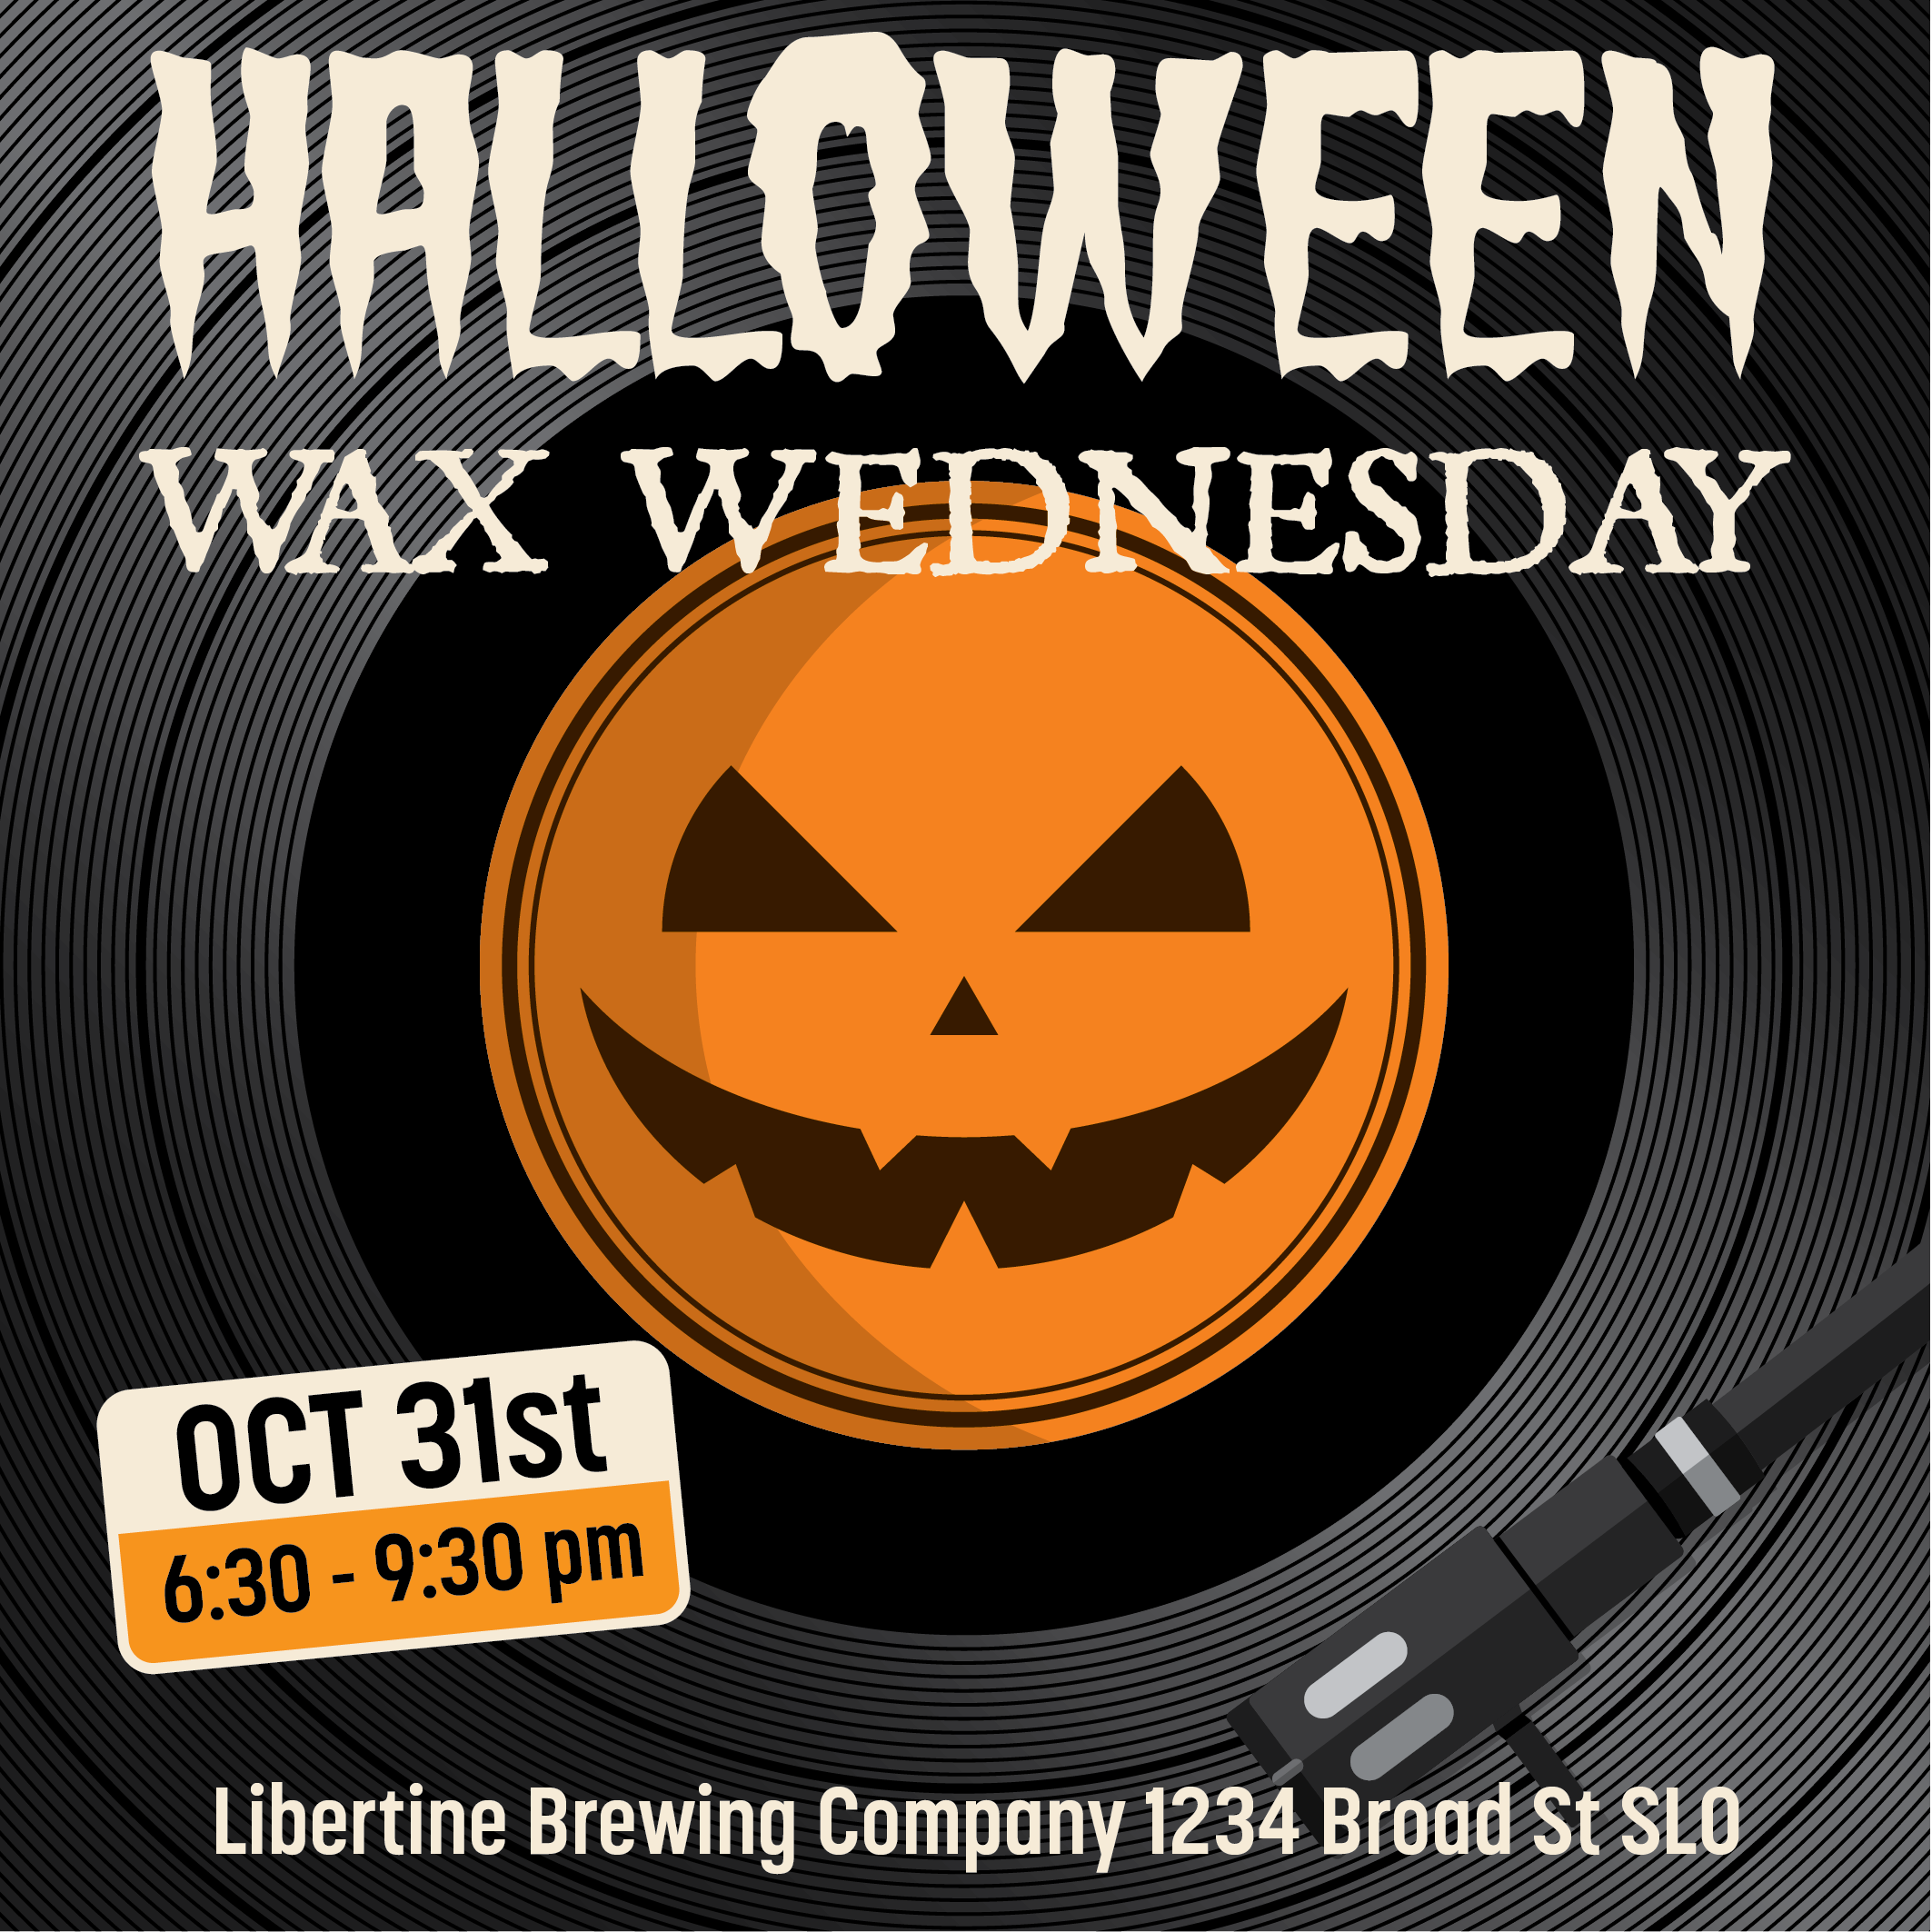 halloween wax wednesday-01.png